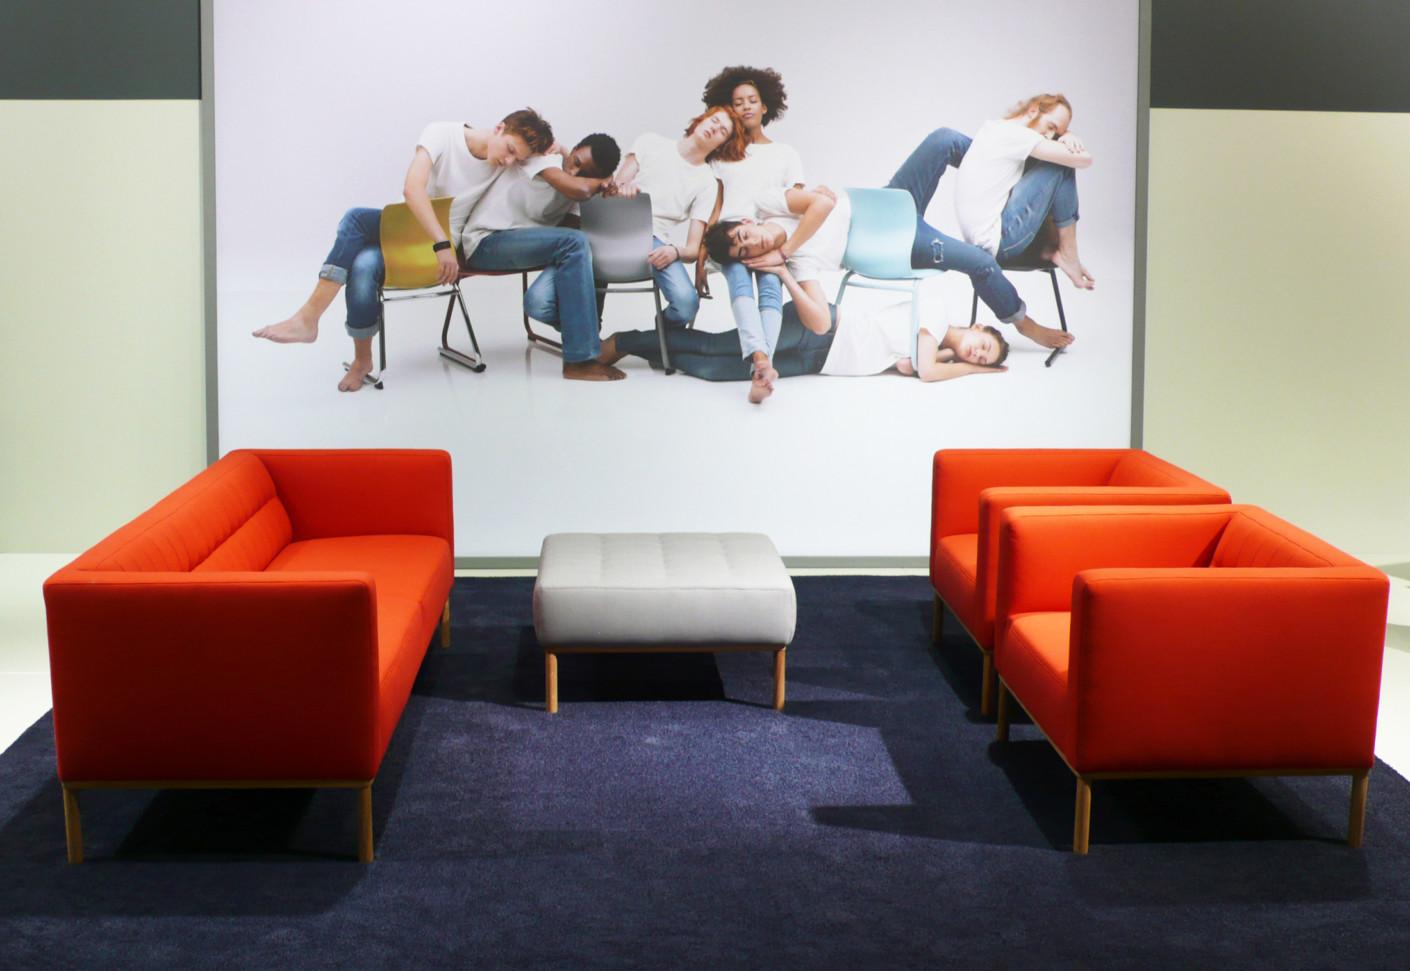 kche otto finest amazing eckbank modern bei otto with otto kche with kche otto moderne. Black Bedroom Furniture Sets. Home Design Ideas